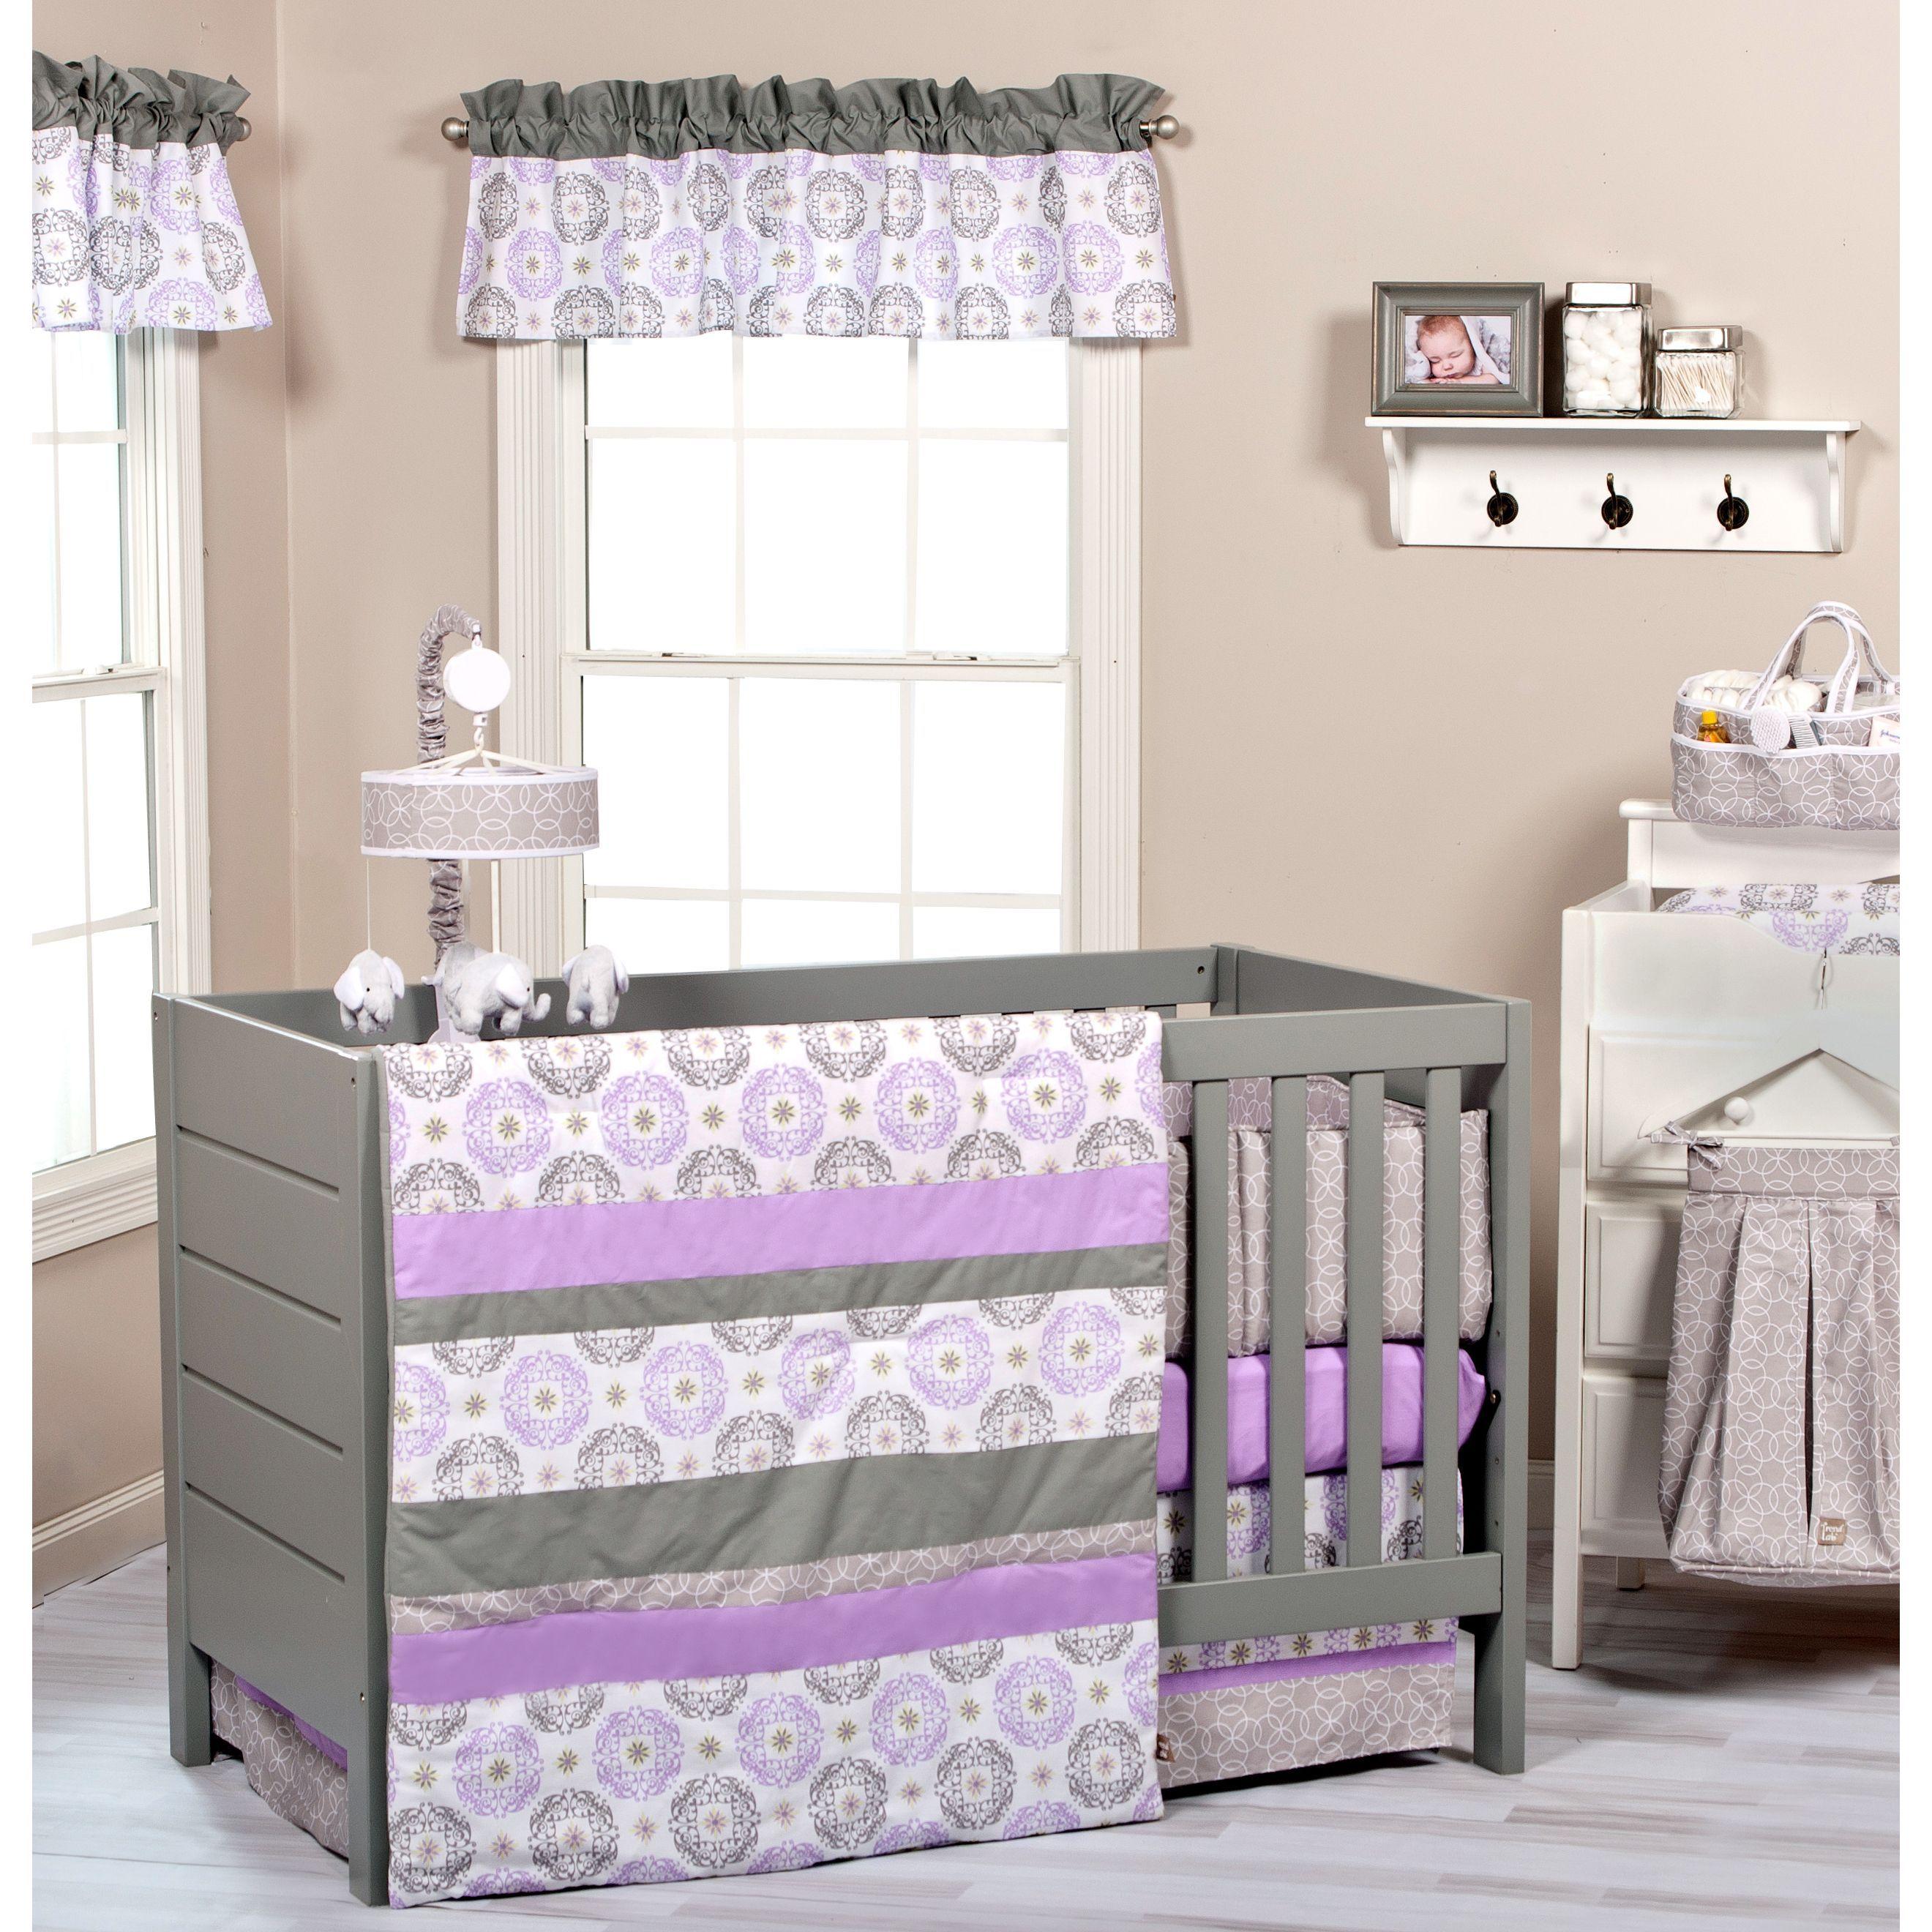 Florence 3 Piece Crib Bedding Set | Nursery | Pinterest